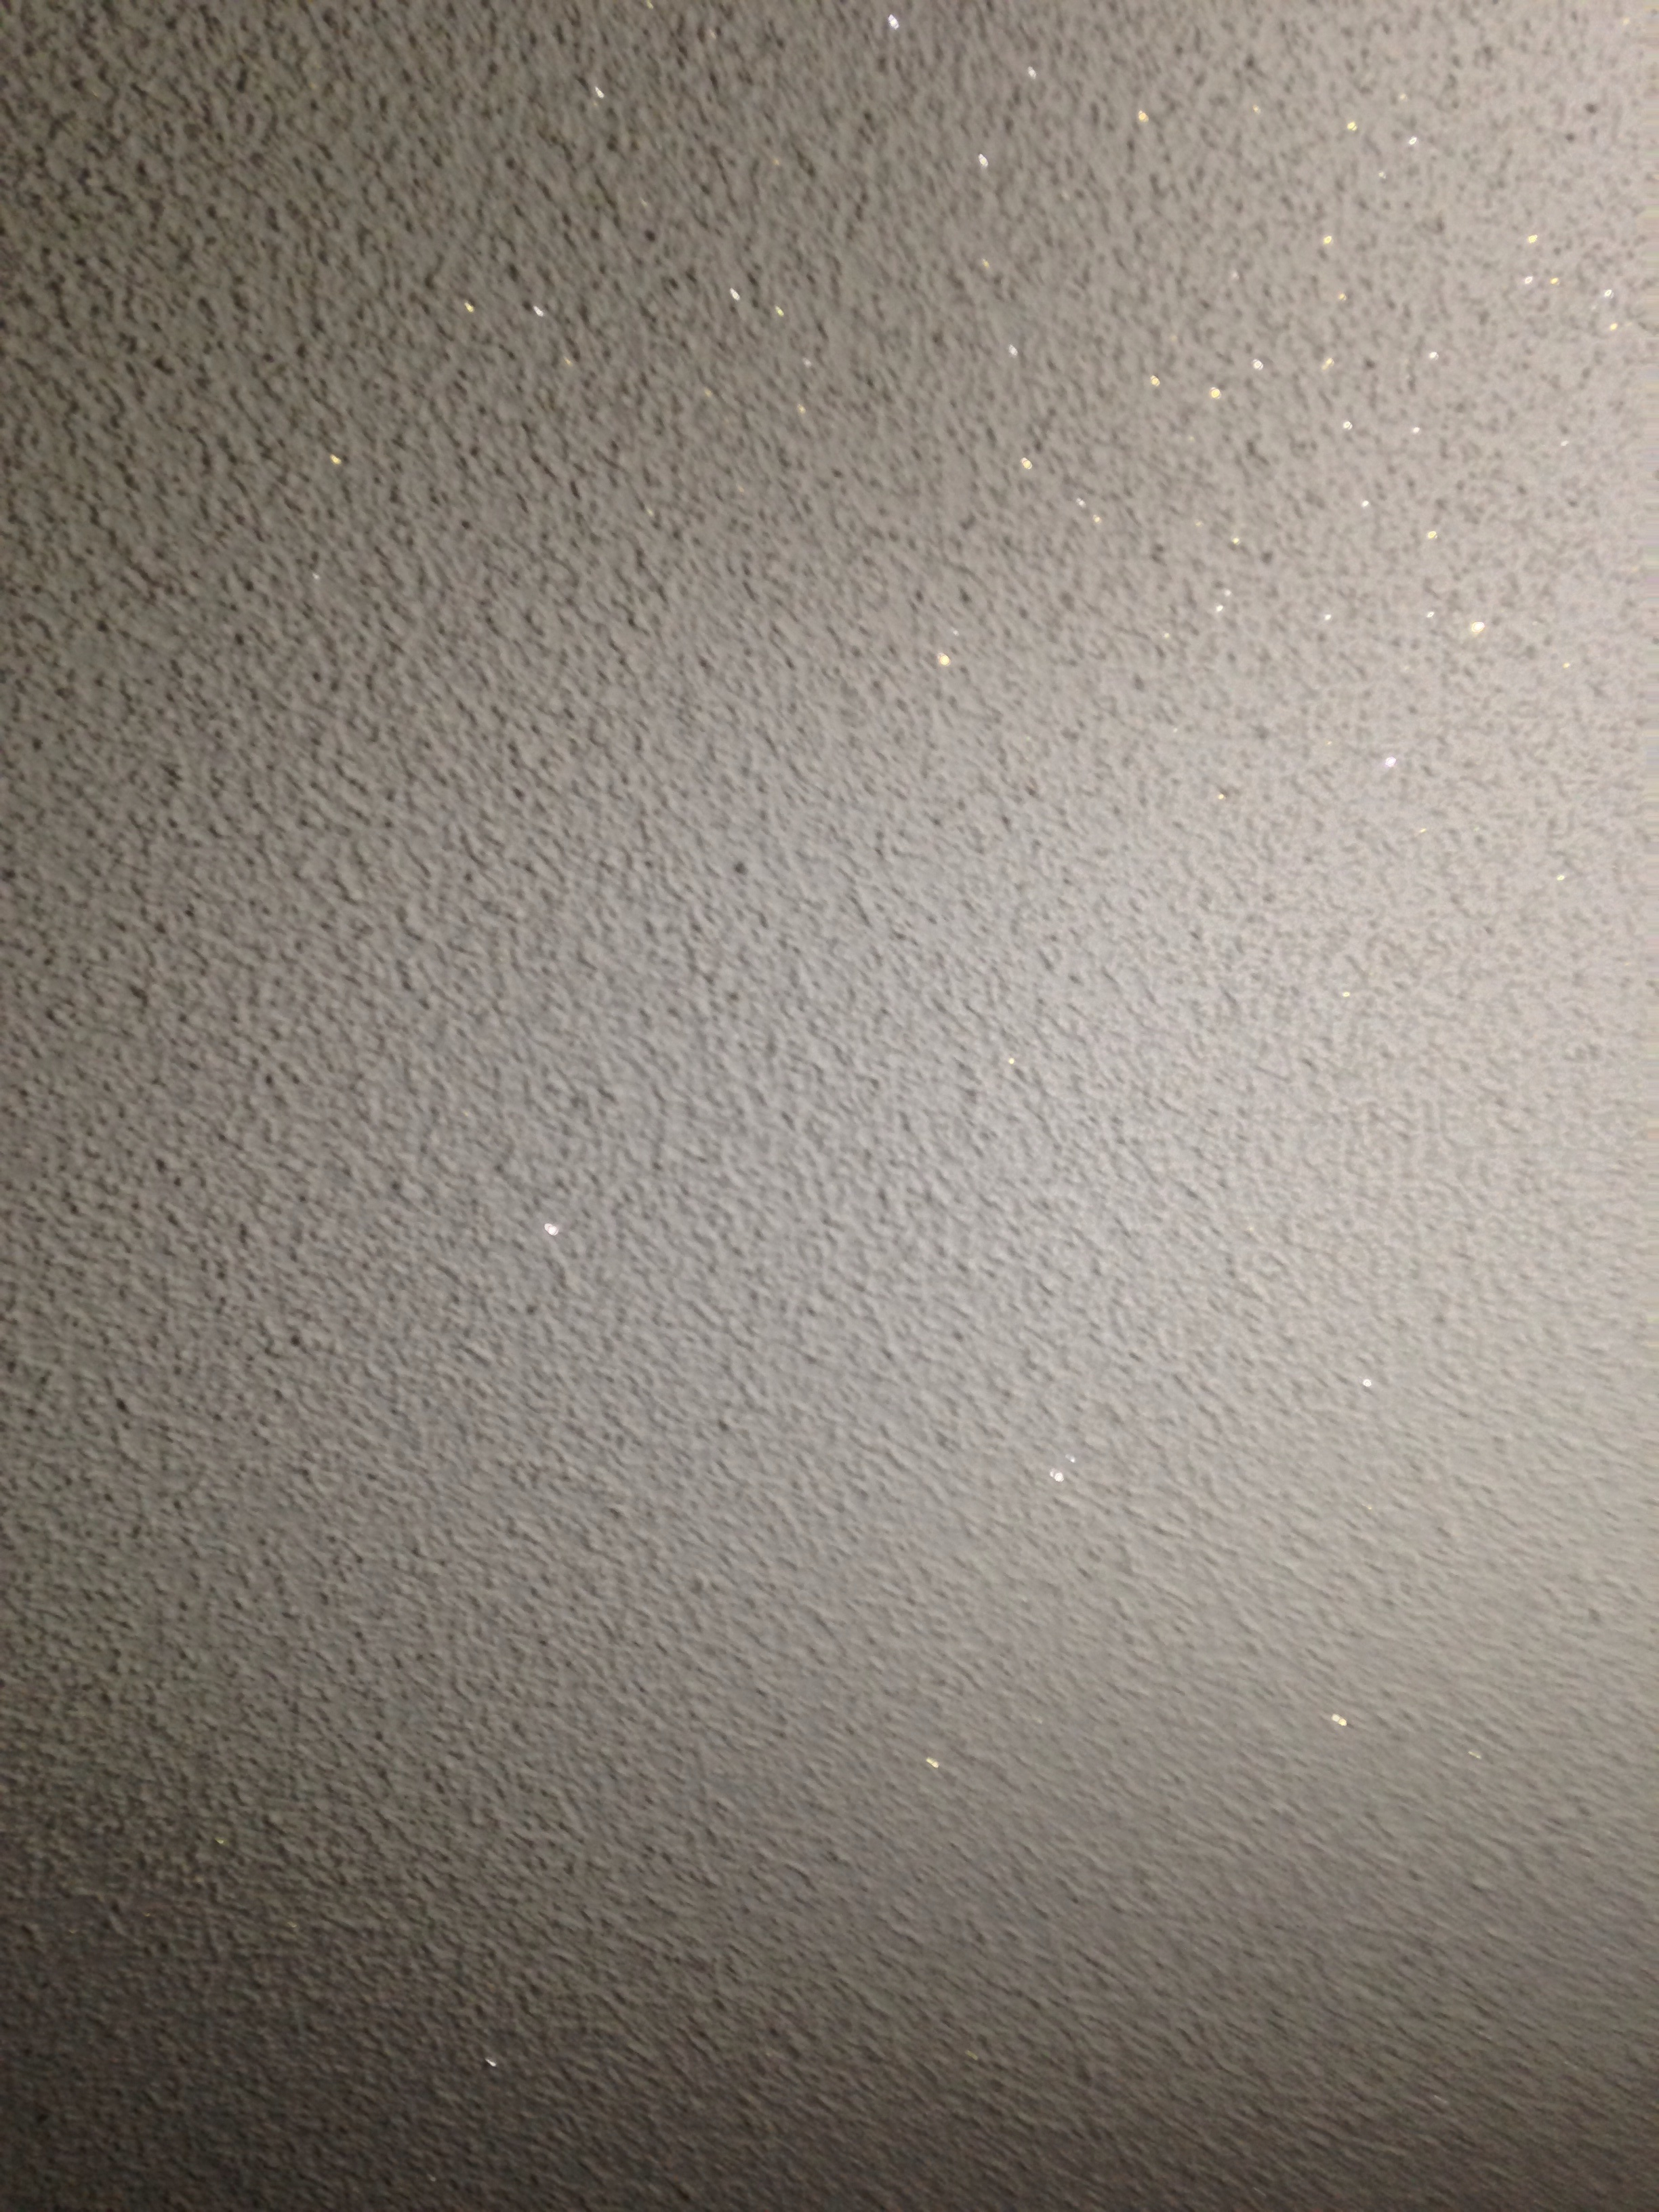 View from Rm. 112, Rodeway Inn, Washington Blvd., Culver City, Ca. March 22, 2016.